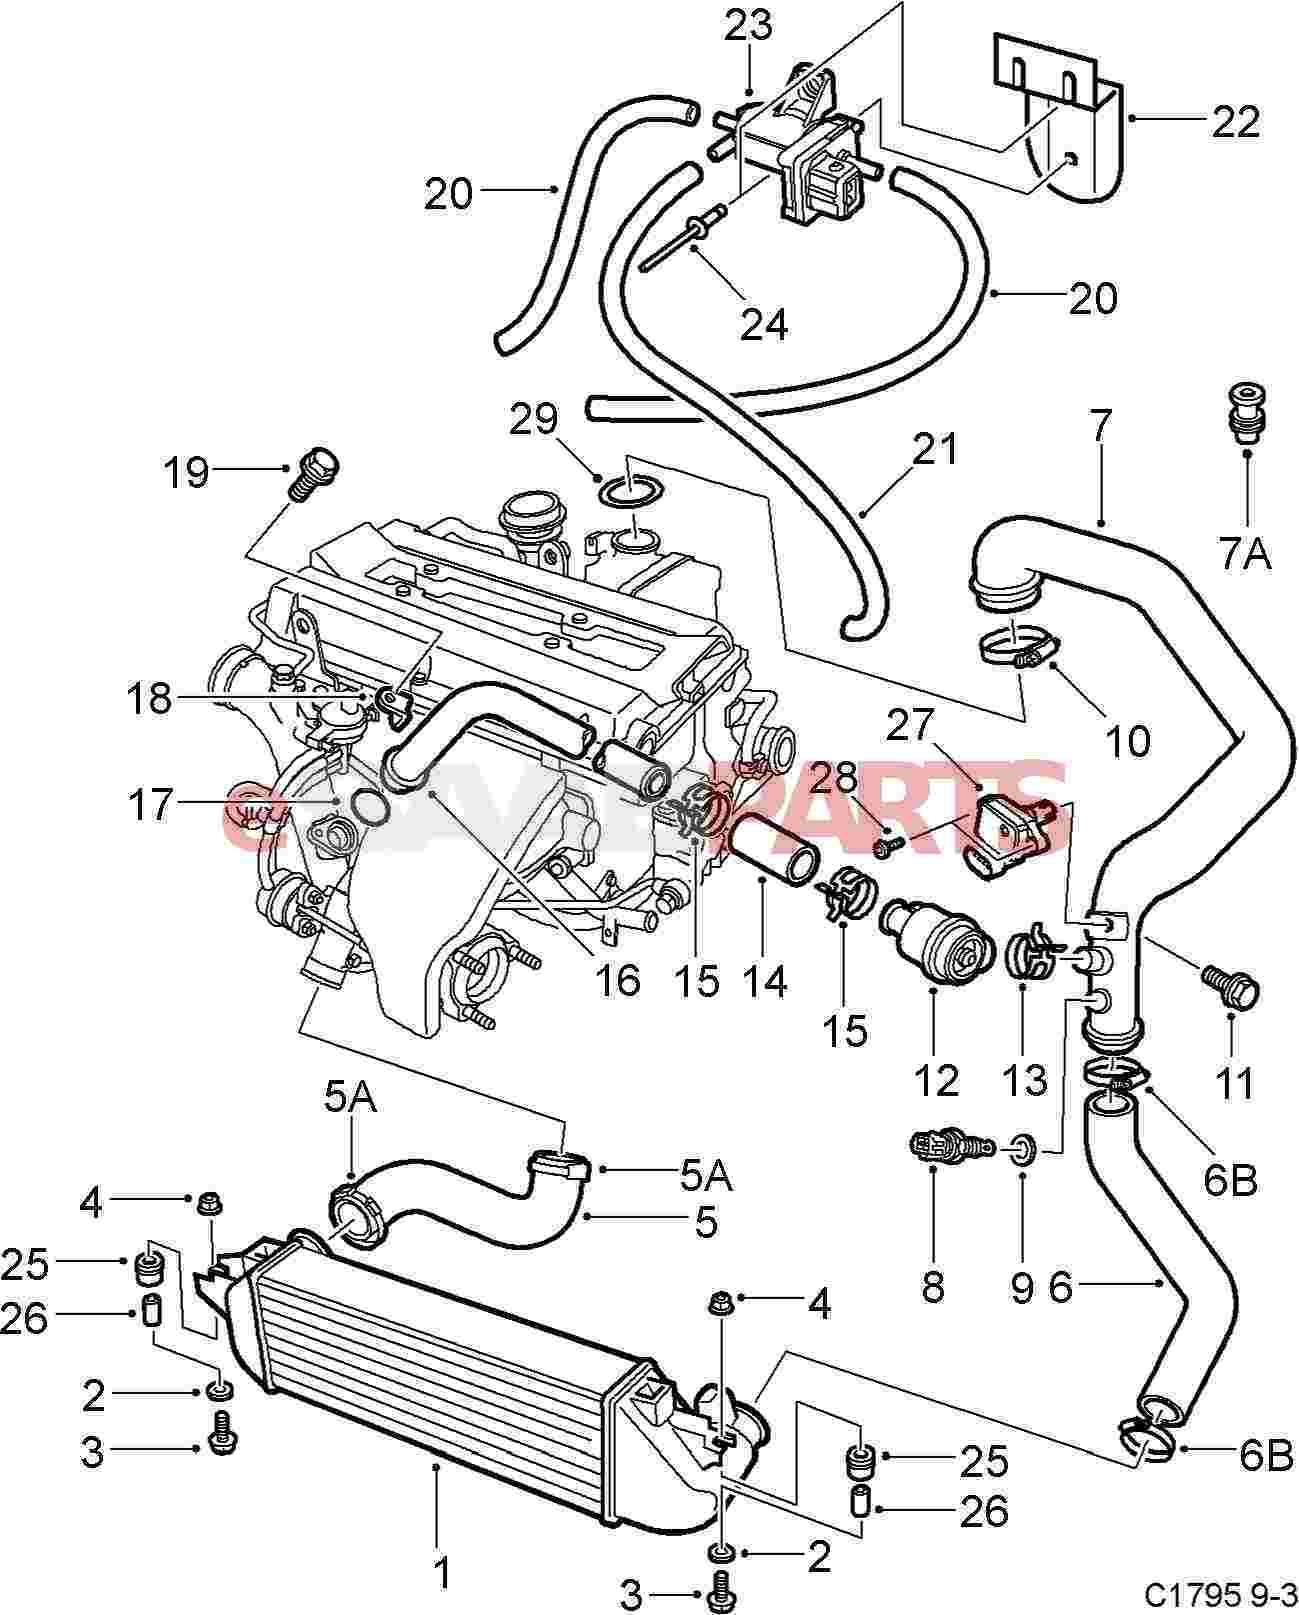 hitachi 120-2 manual pump bypass